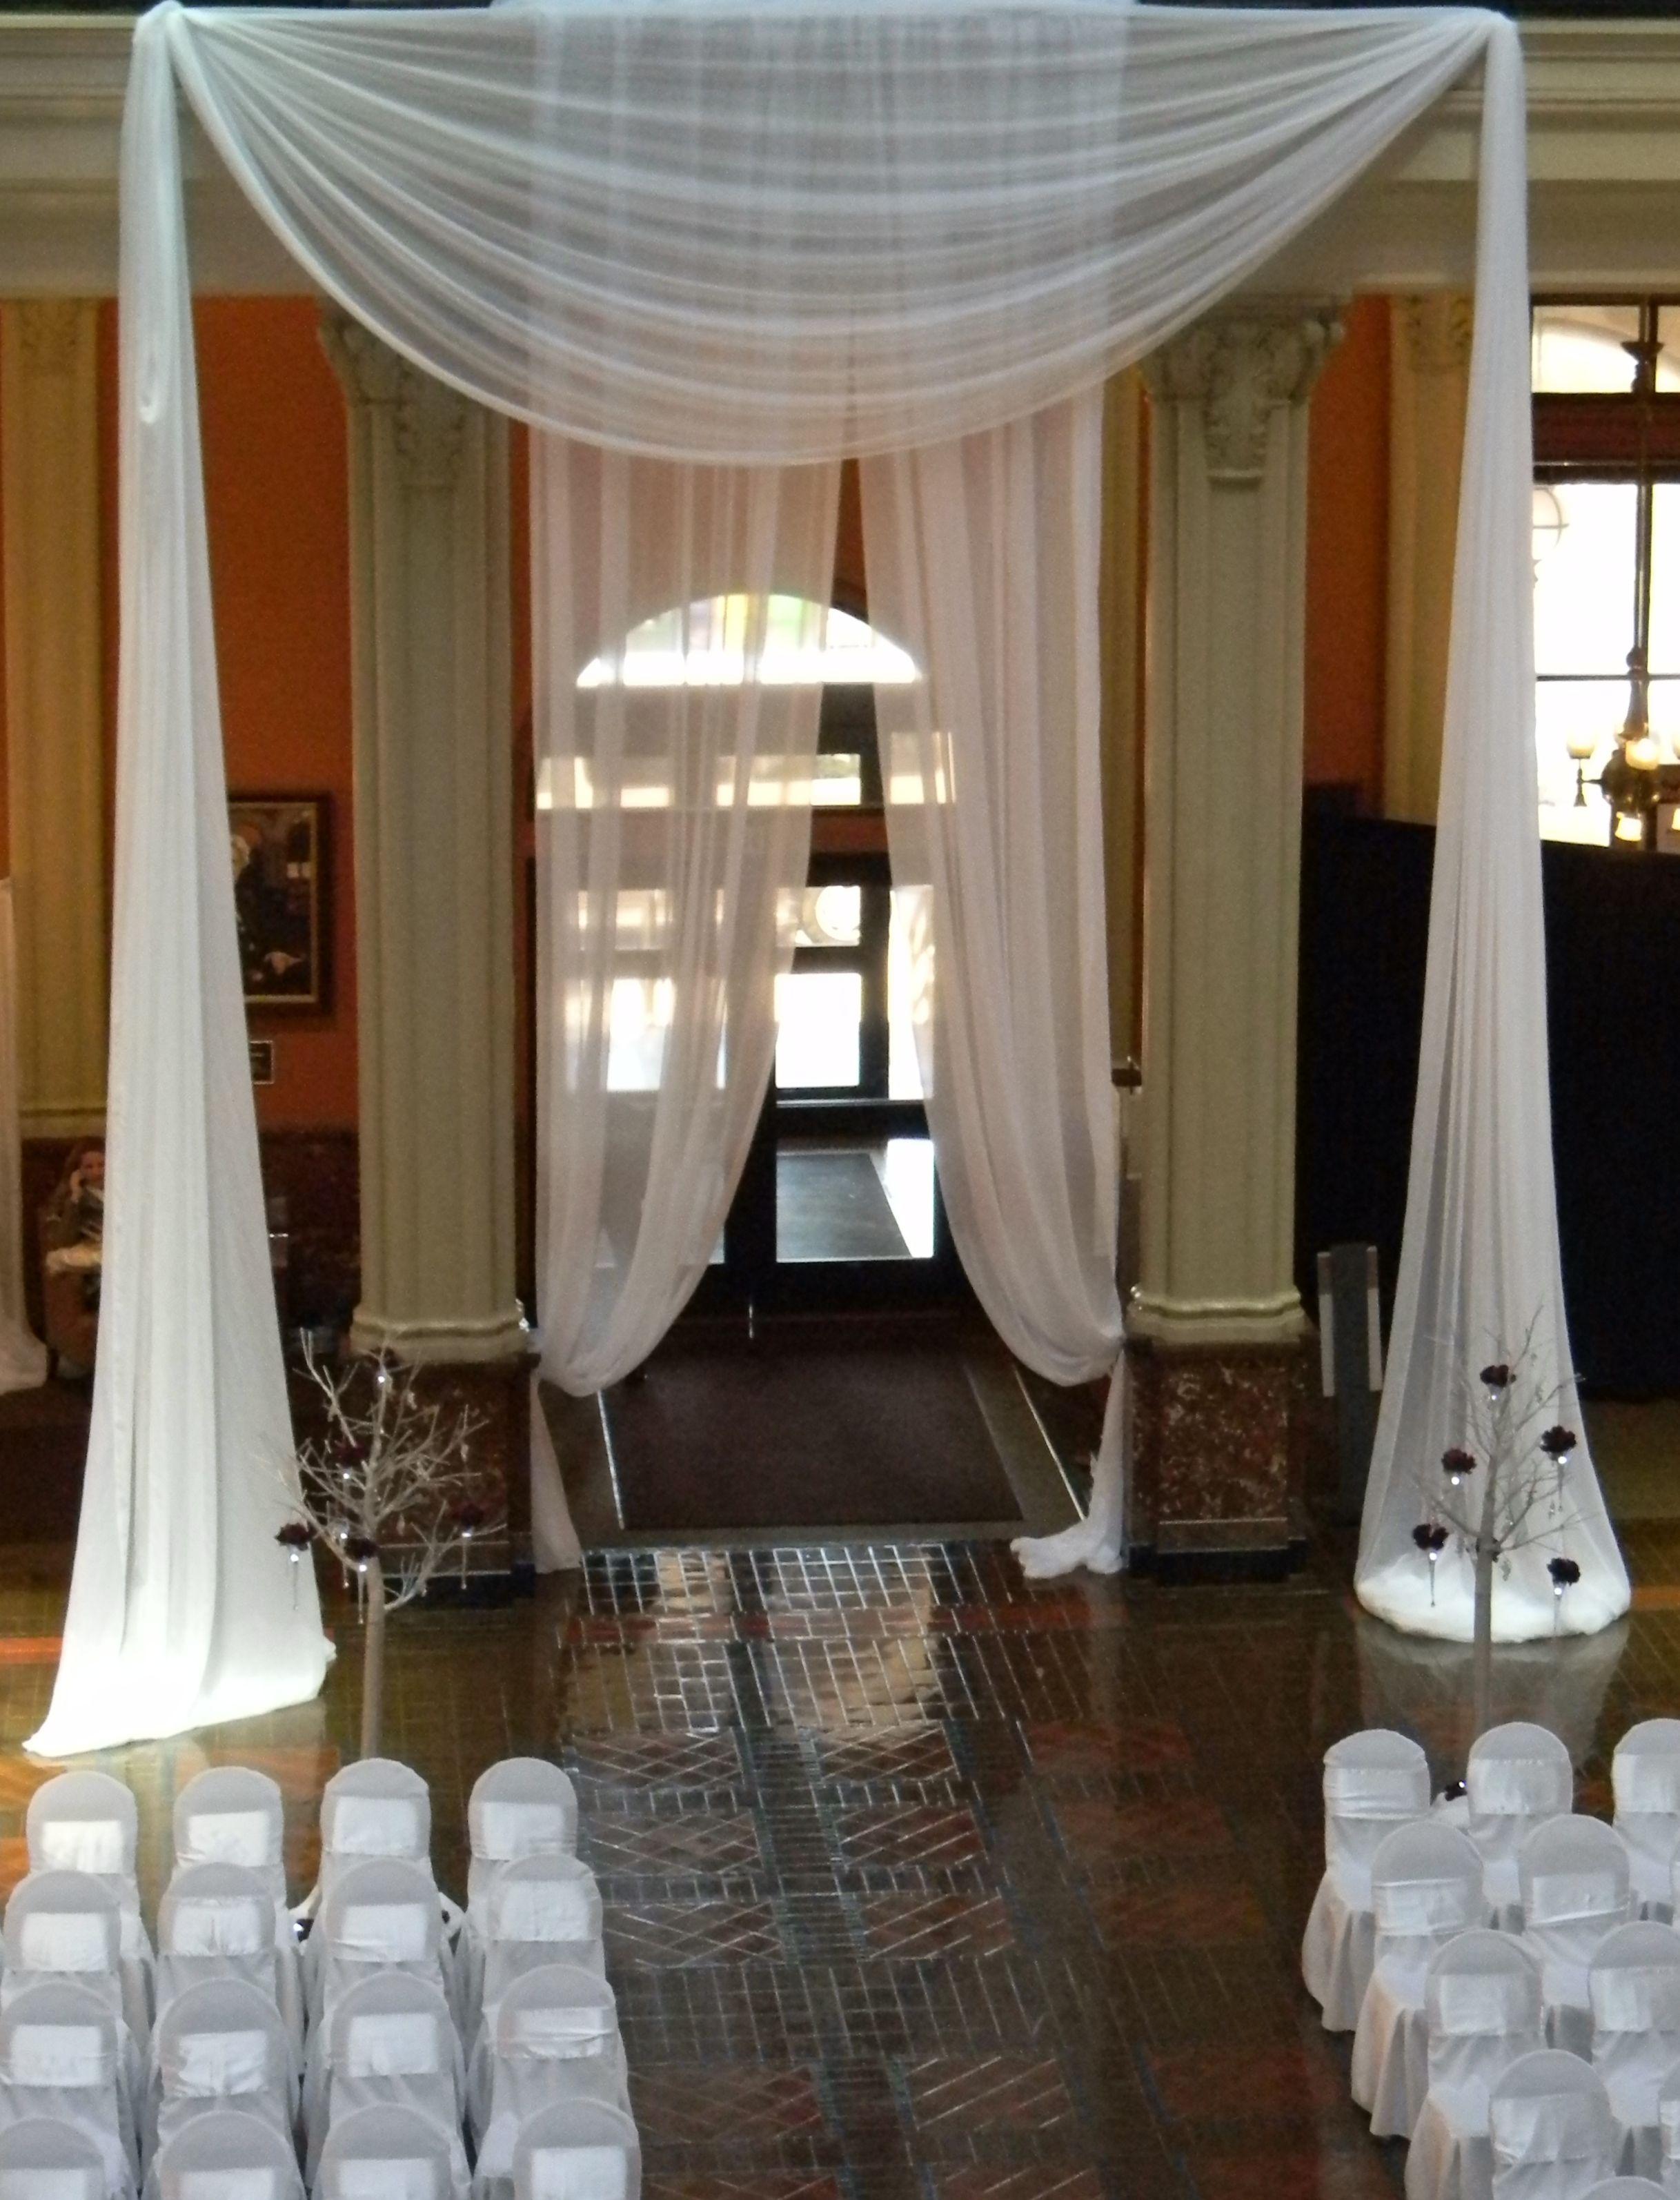 Chair Covers Oriental Trading Outdoor Egg Nz Landmark Center In St Paul Mn Draping Linens